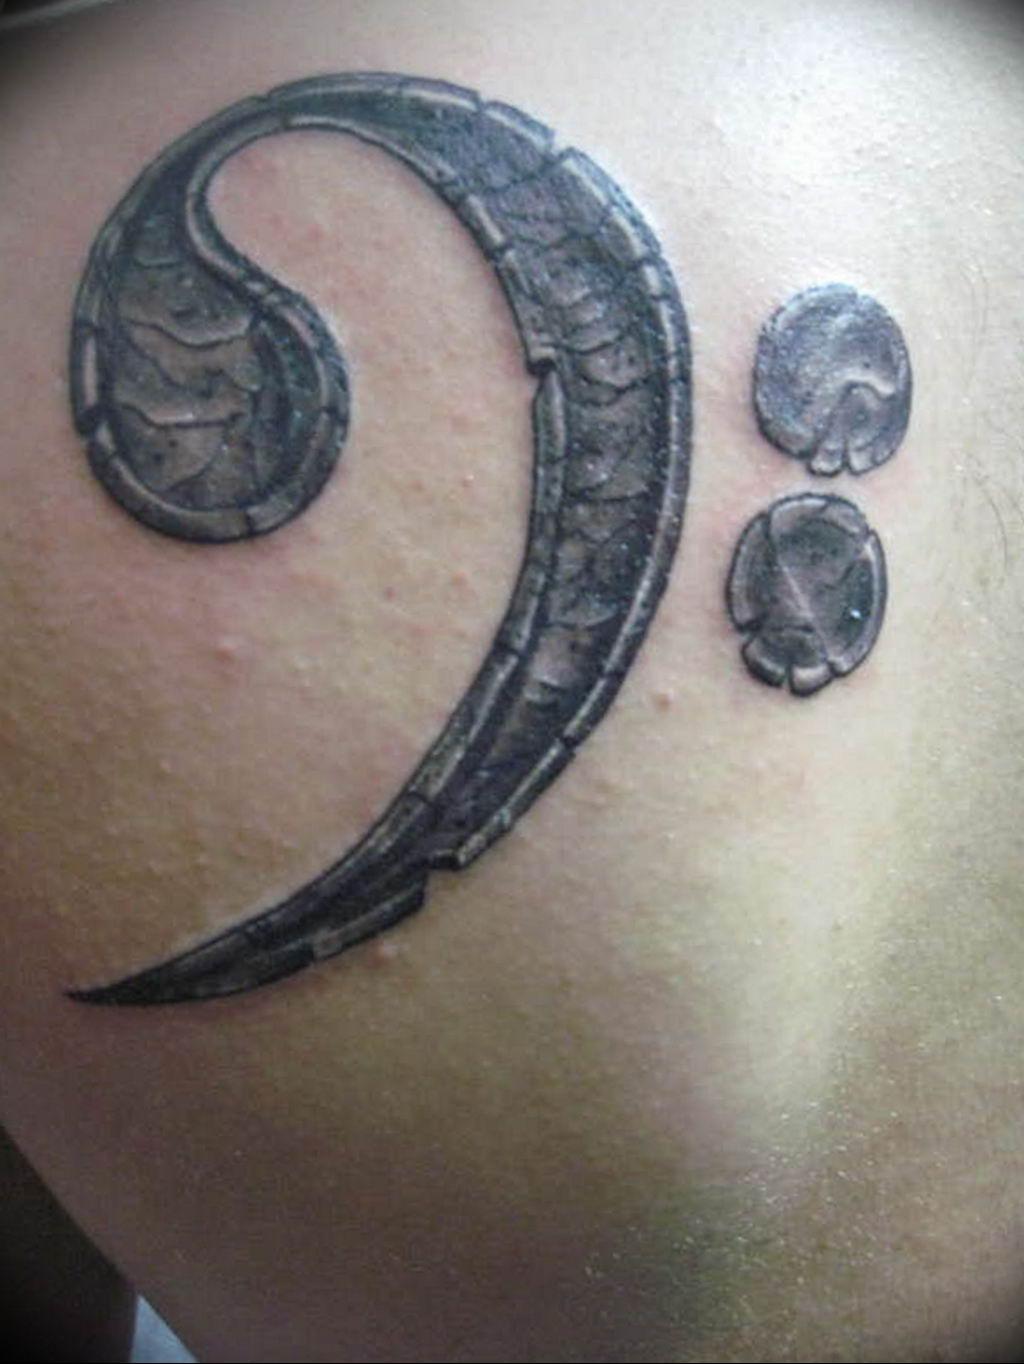 Фото басовый ключ тату 21.08.2019 №008 - bass clef tattoo - tatufoto.com